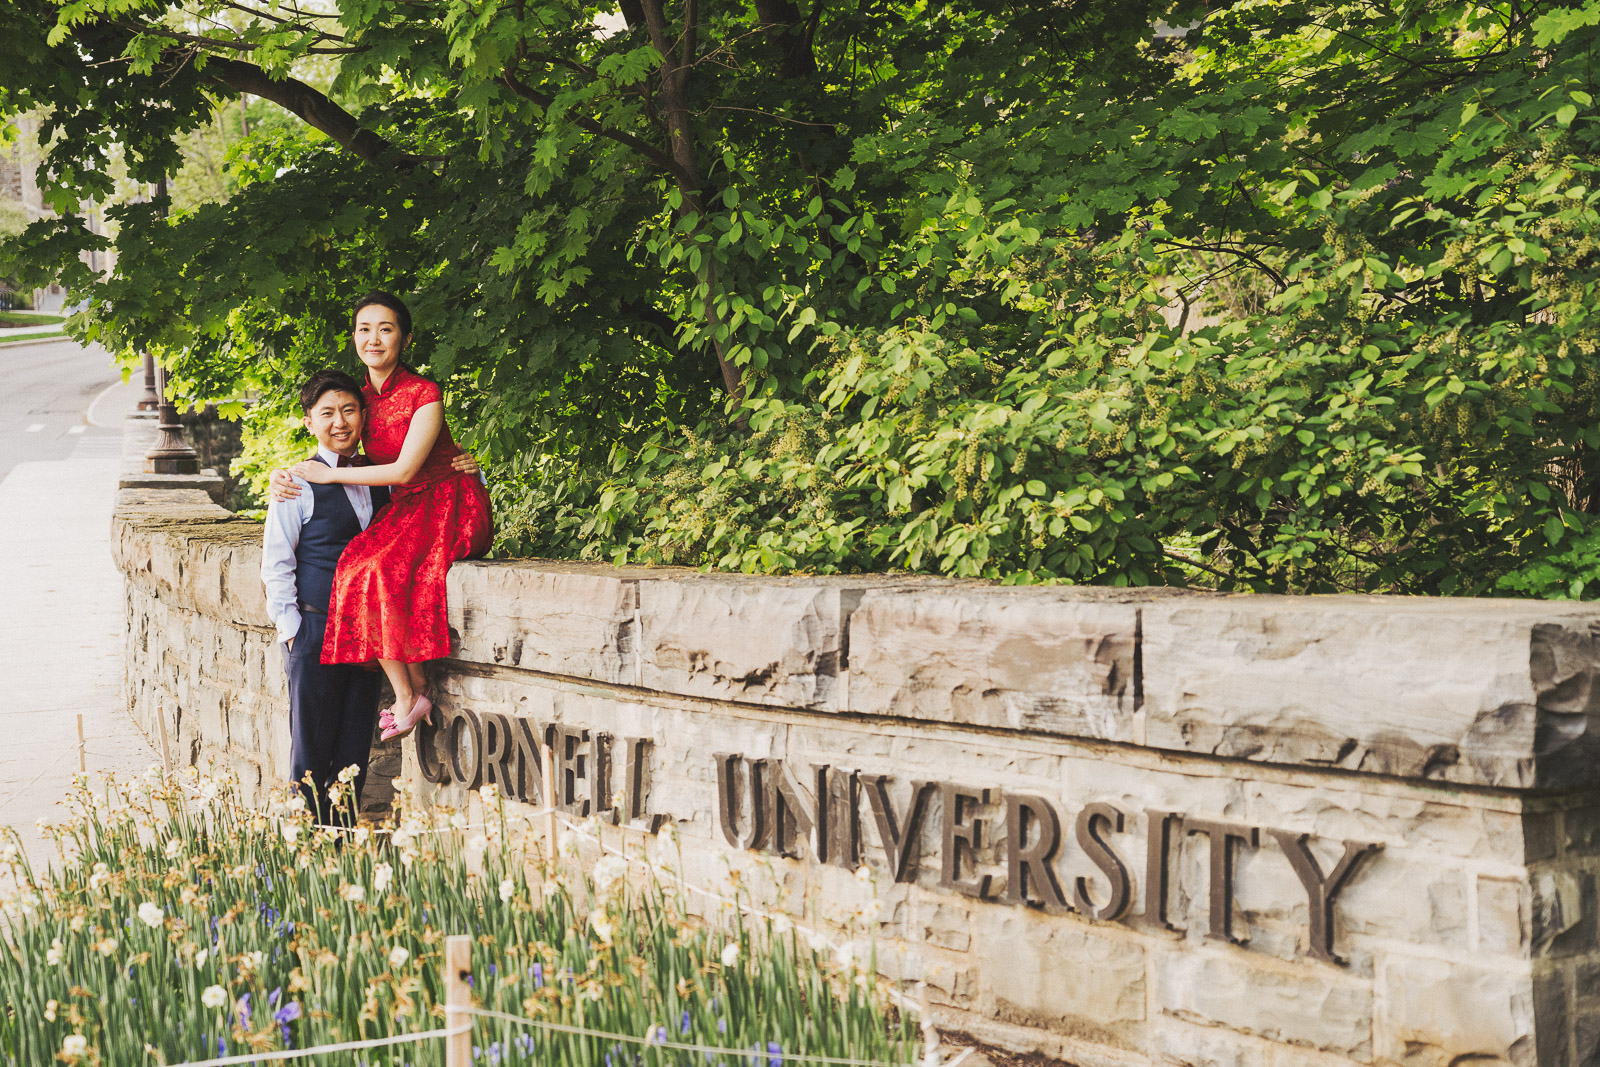 Cornell University engagement photography